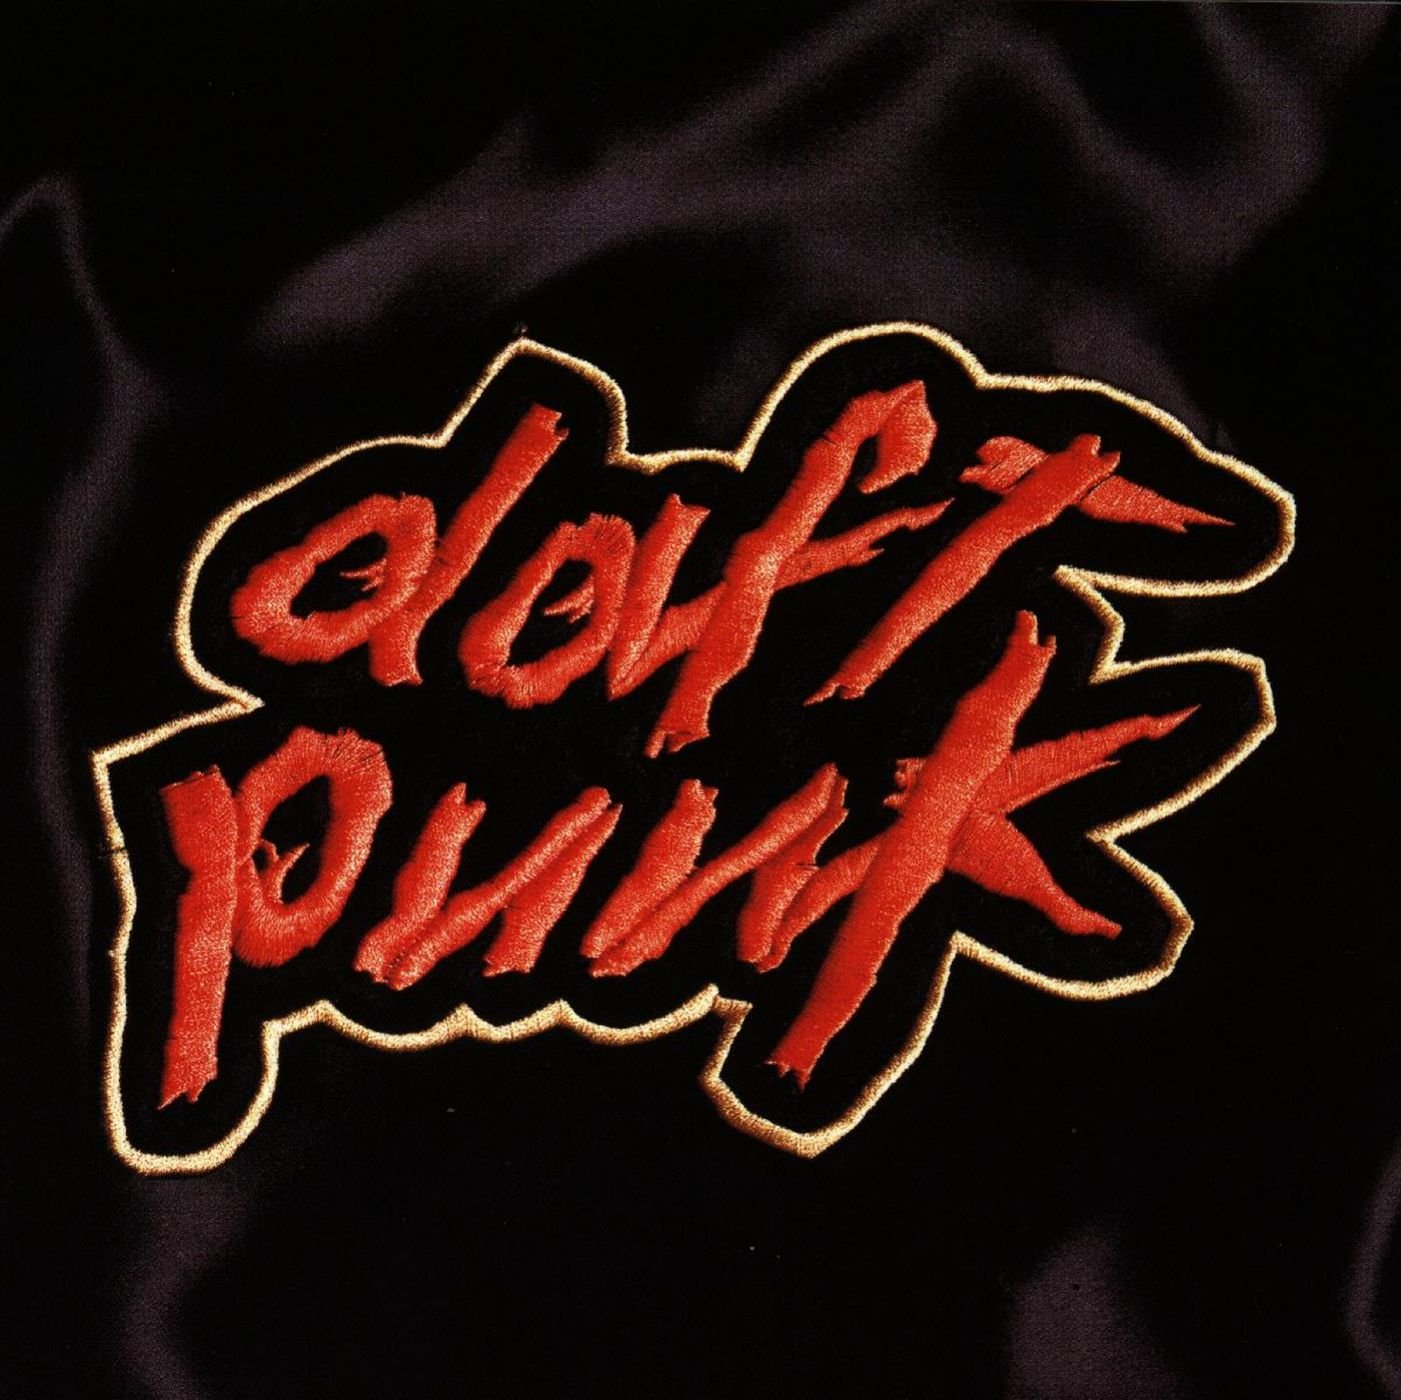 Daft Punk - Homework - Amazon.com Music